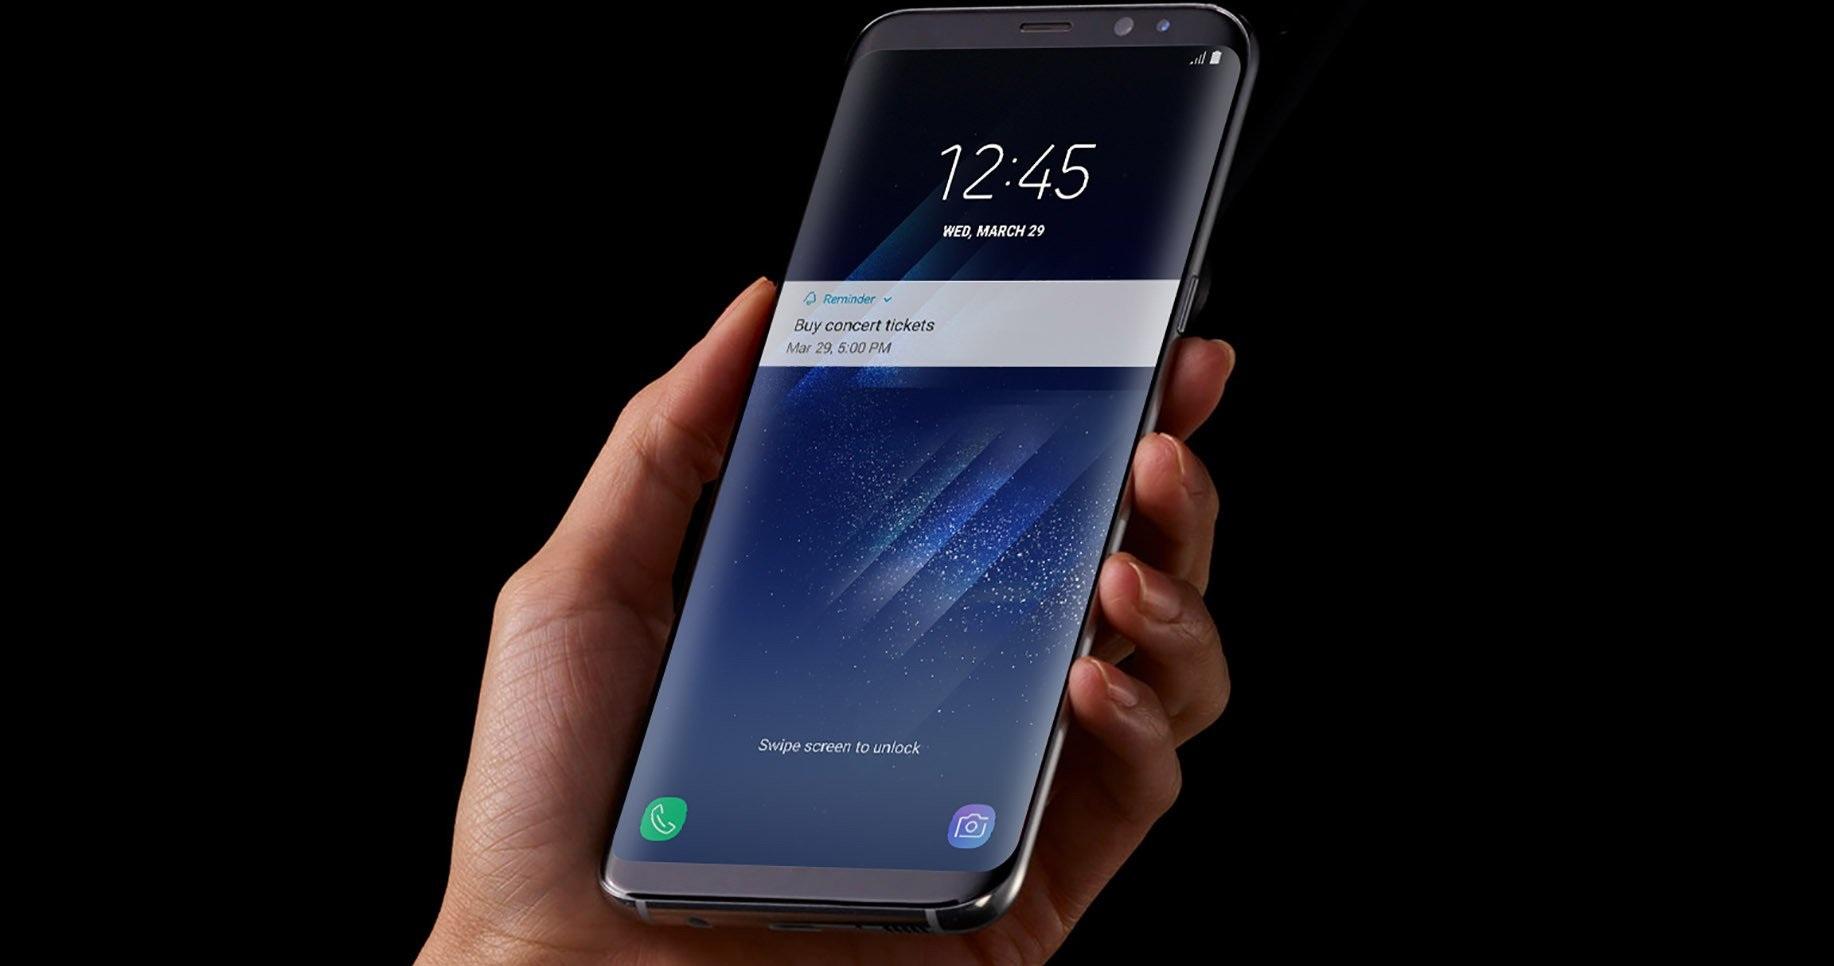 Gia Ban Samsung Galaxy S9 S9 Plus Va Ngay Len Ke Chinh Thuc Tai Vn 01